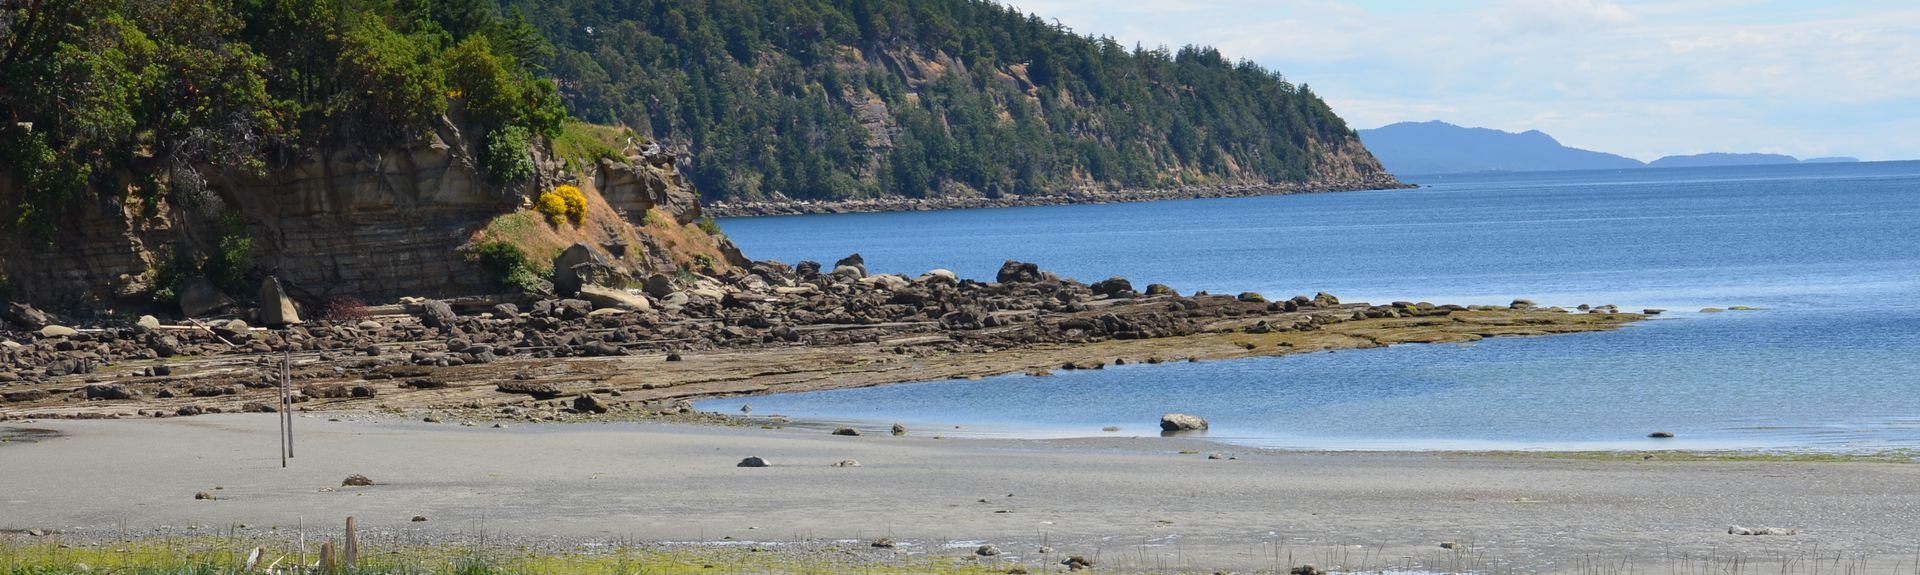 Crown Isle Resort and Golf Community, Courtenay, British Columbia, Canada